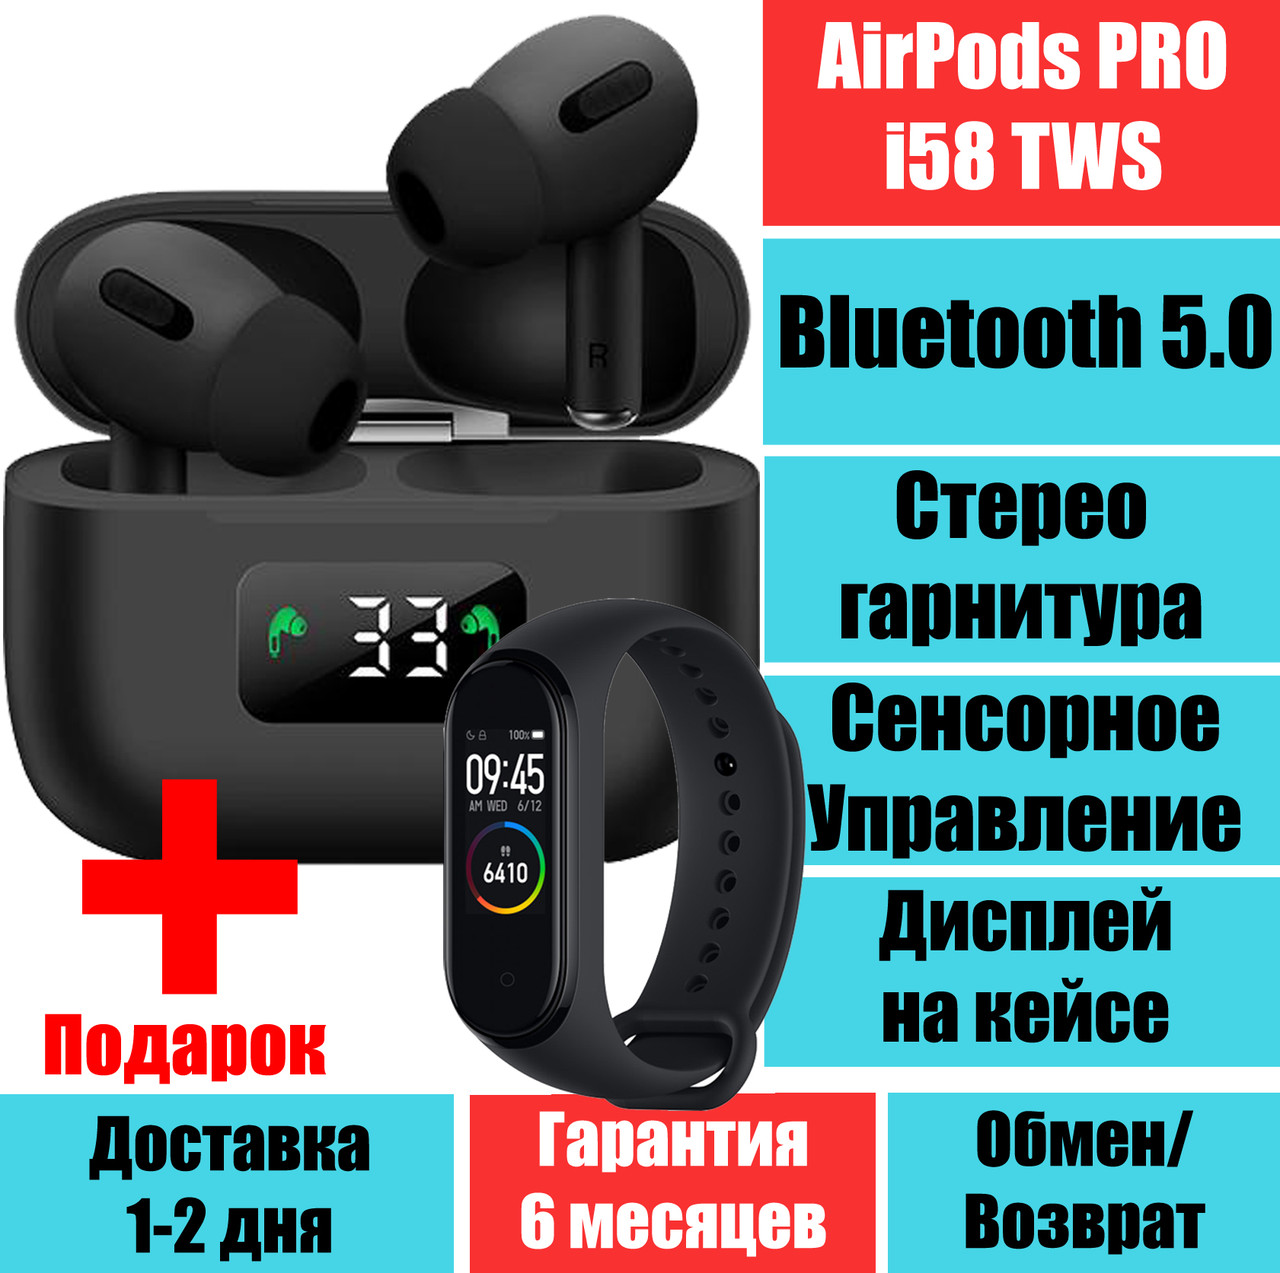 Наушники Аирподс Про i58 TWS APRO3 LCD Sensor Bluetooth 5.0 Стерео гарнитура + подарок браслет M4